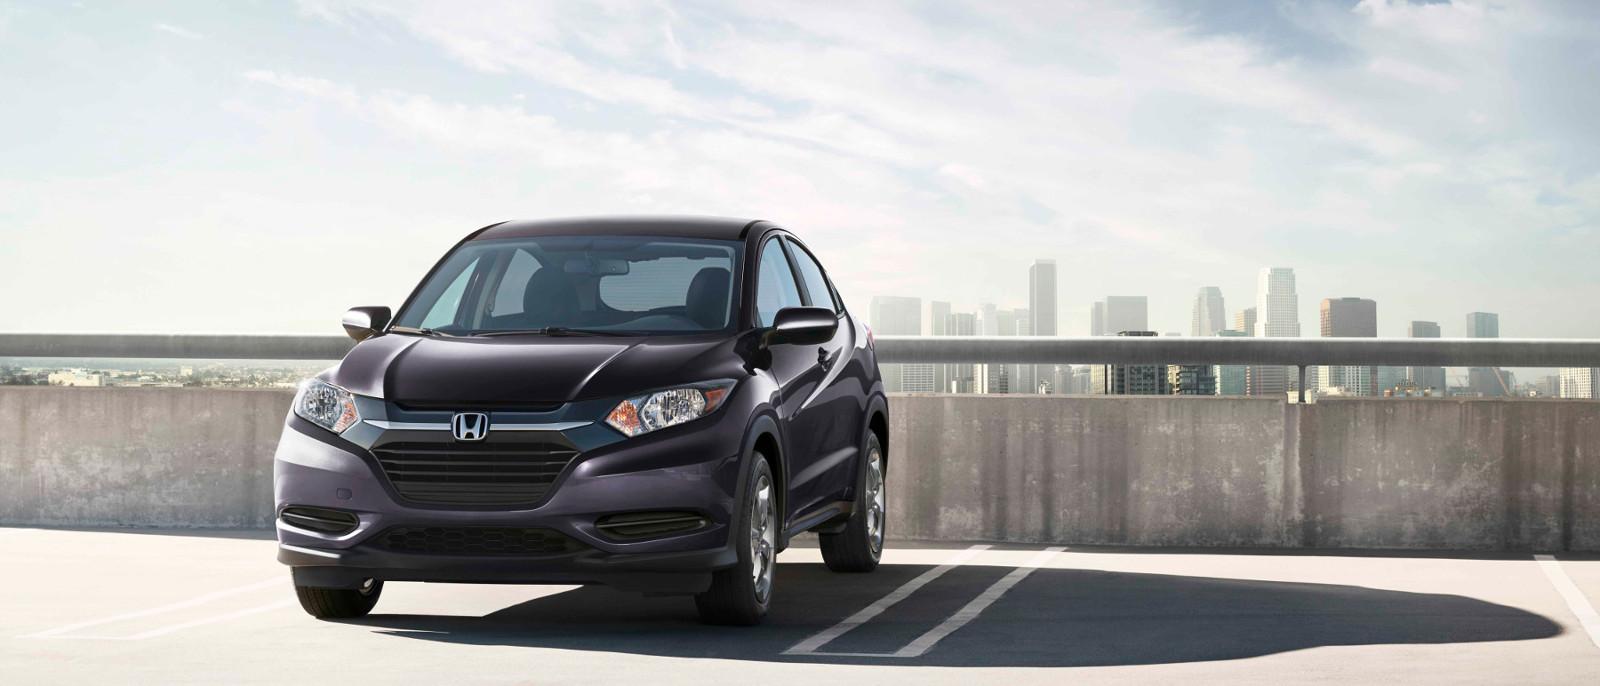 2016 Honda HR-V Mulberry Metallic Color